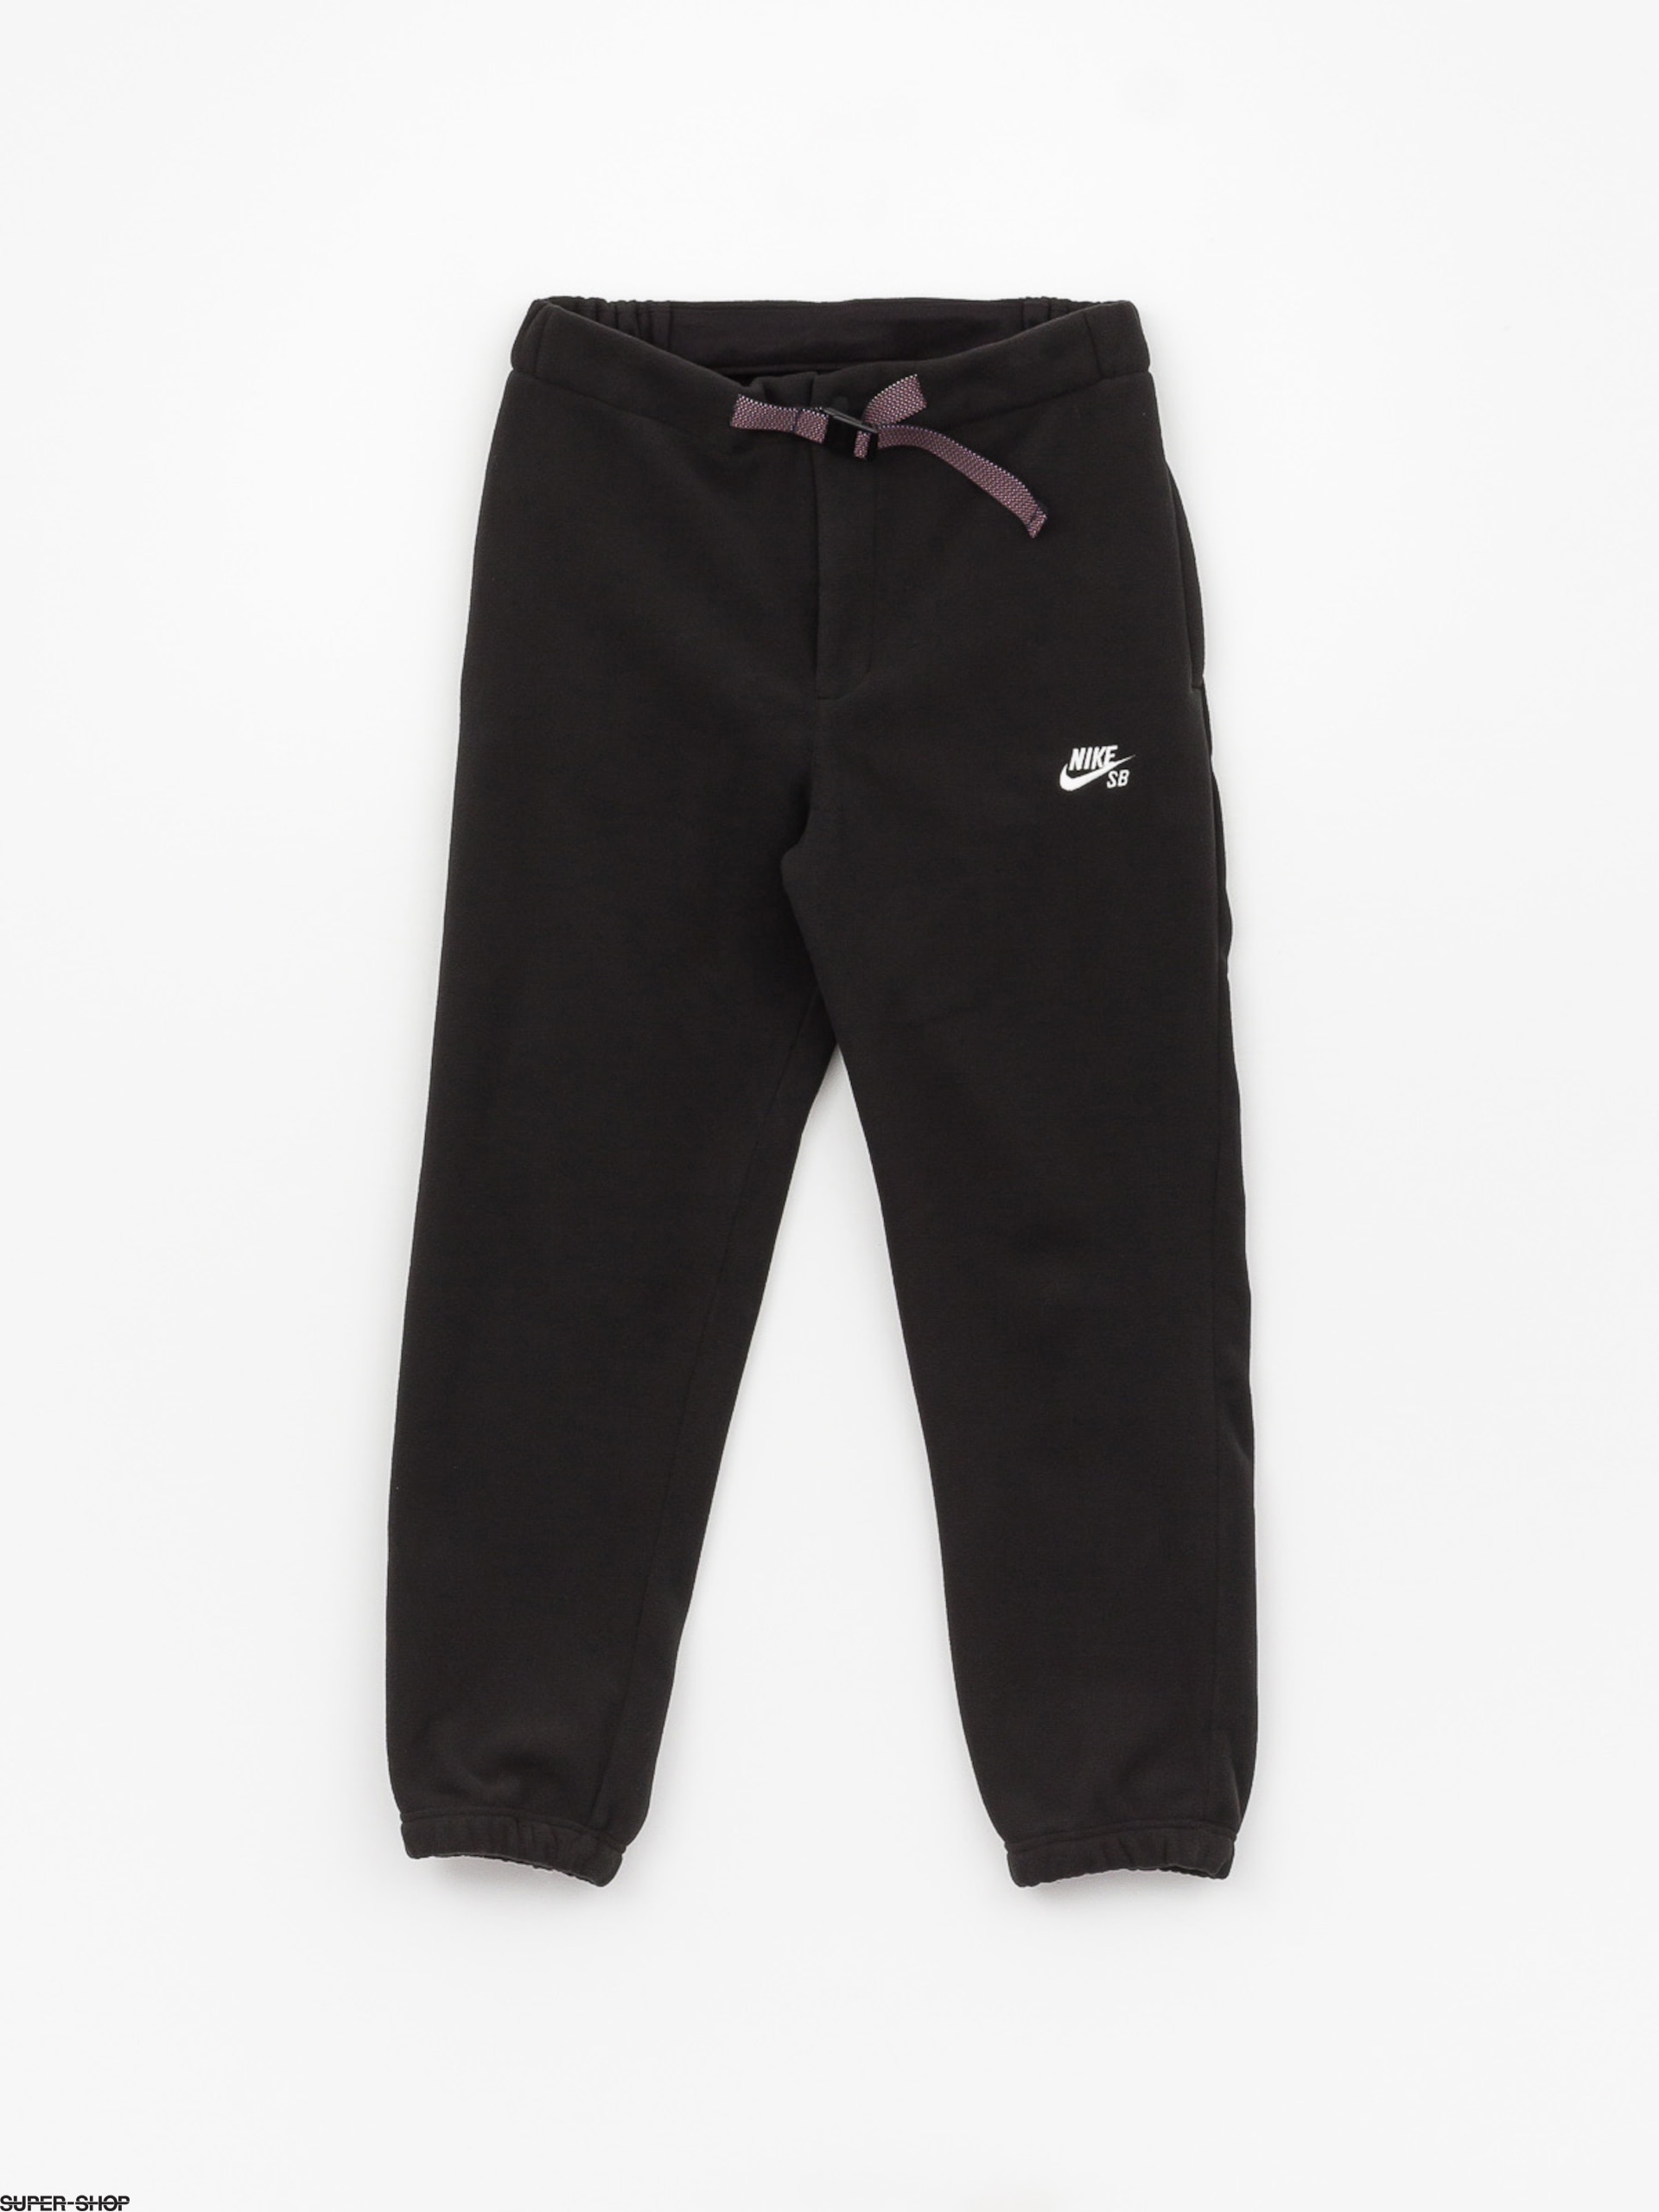 Nike SB Sb Polartec Pants (black white) 7a6c2d92c8a3